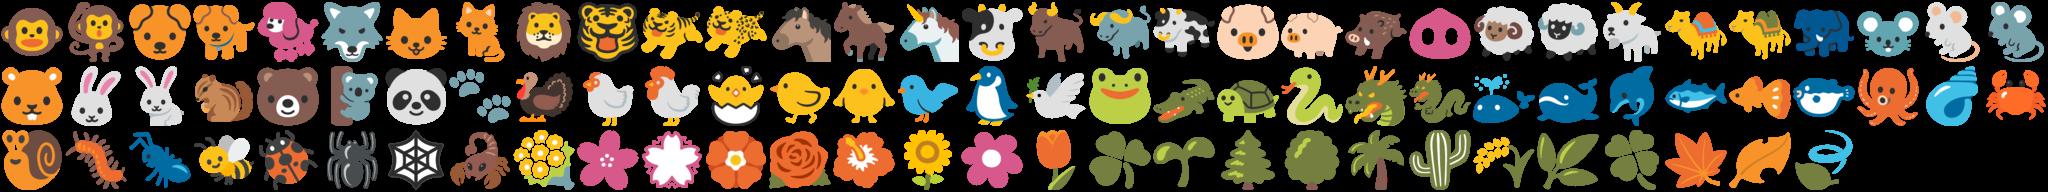 briar-android/src/main/assets/emoji_animals_nature.png